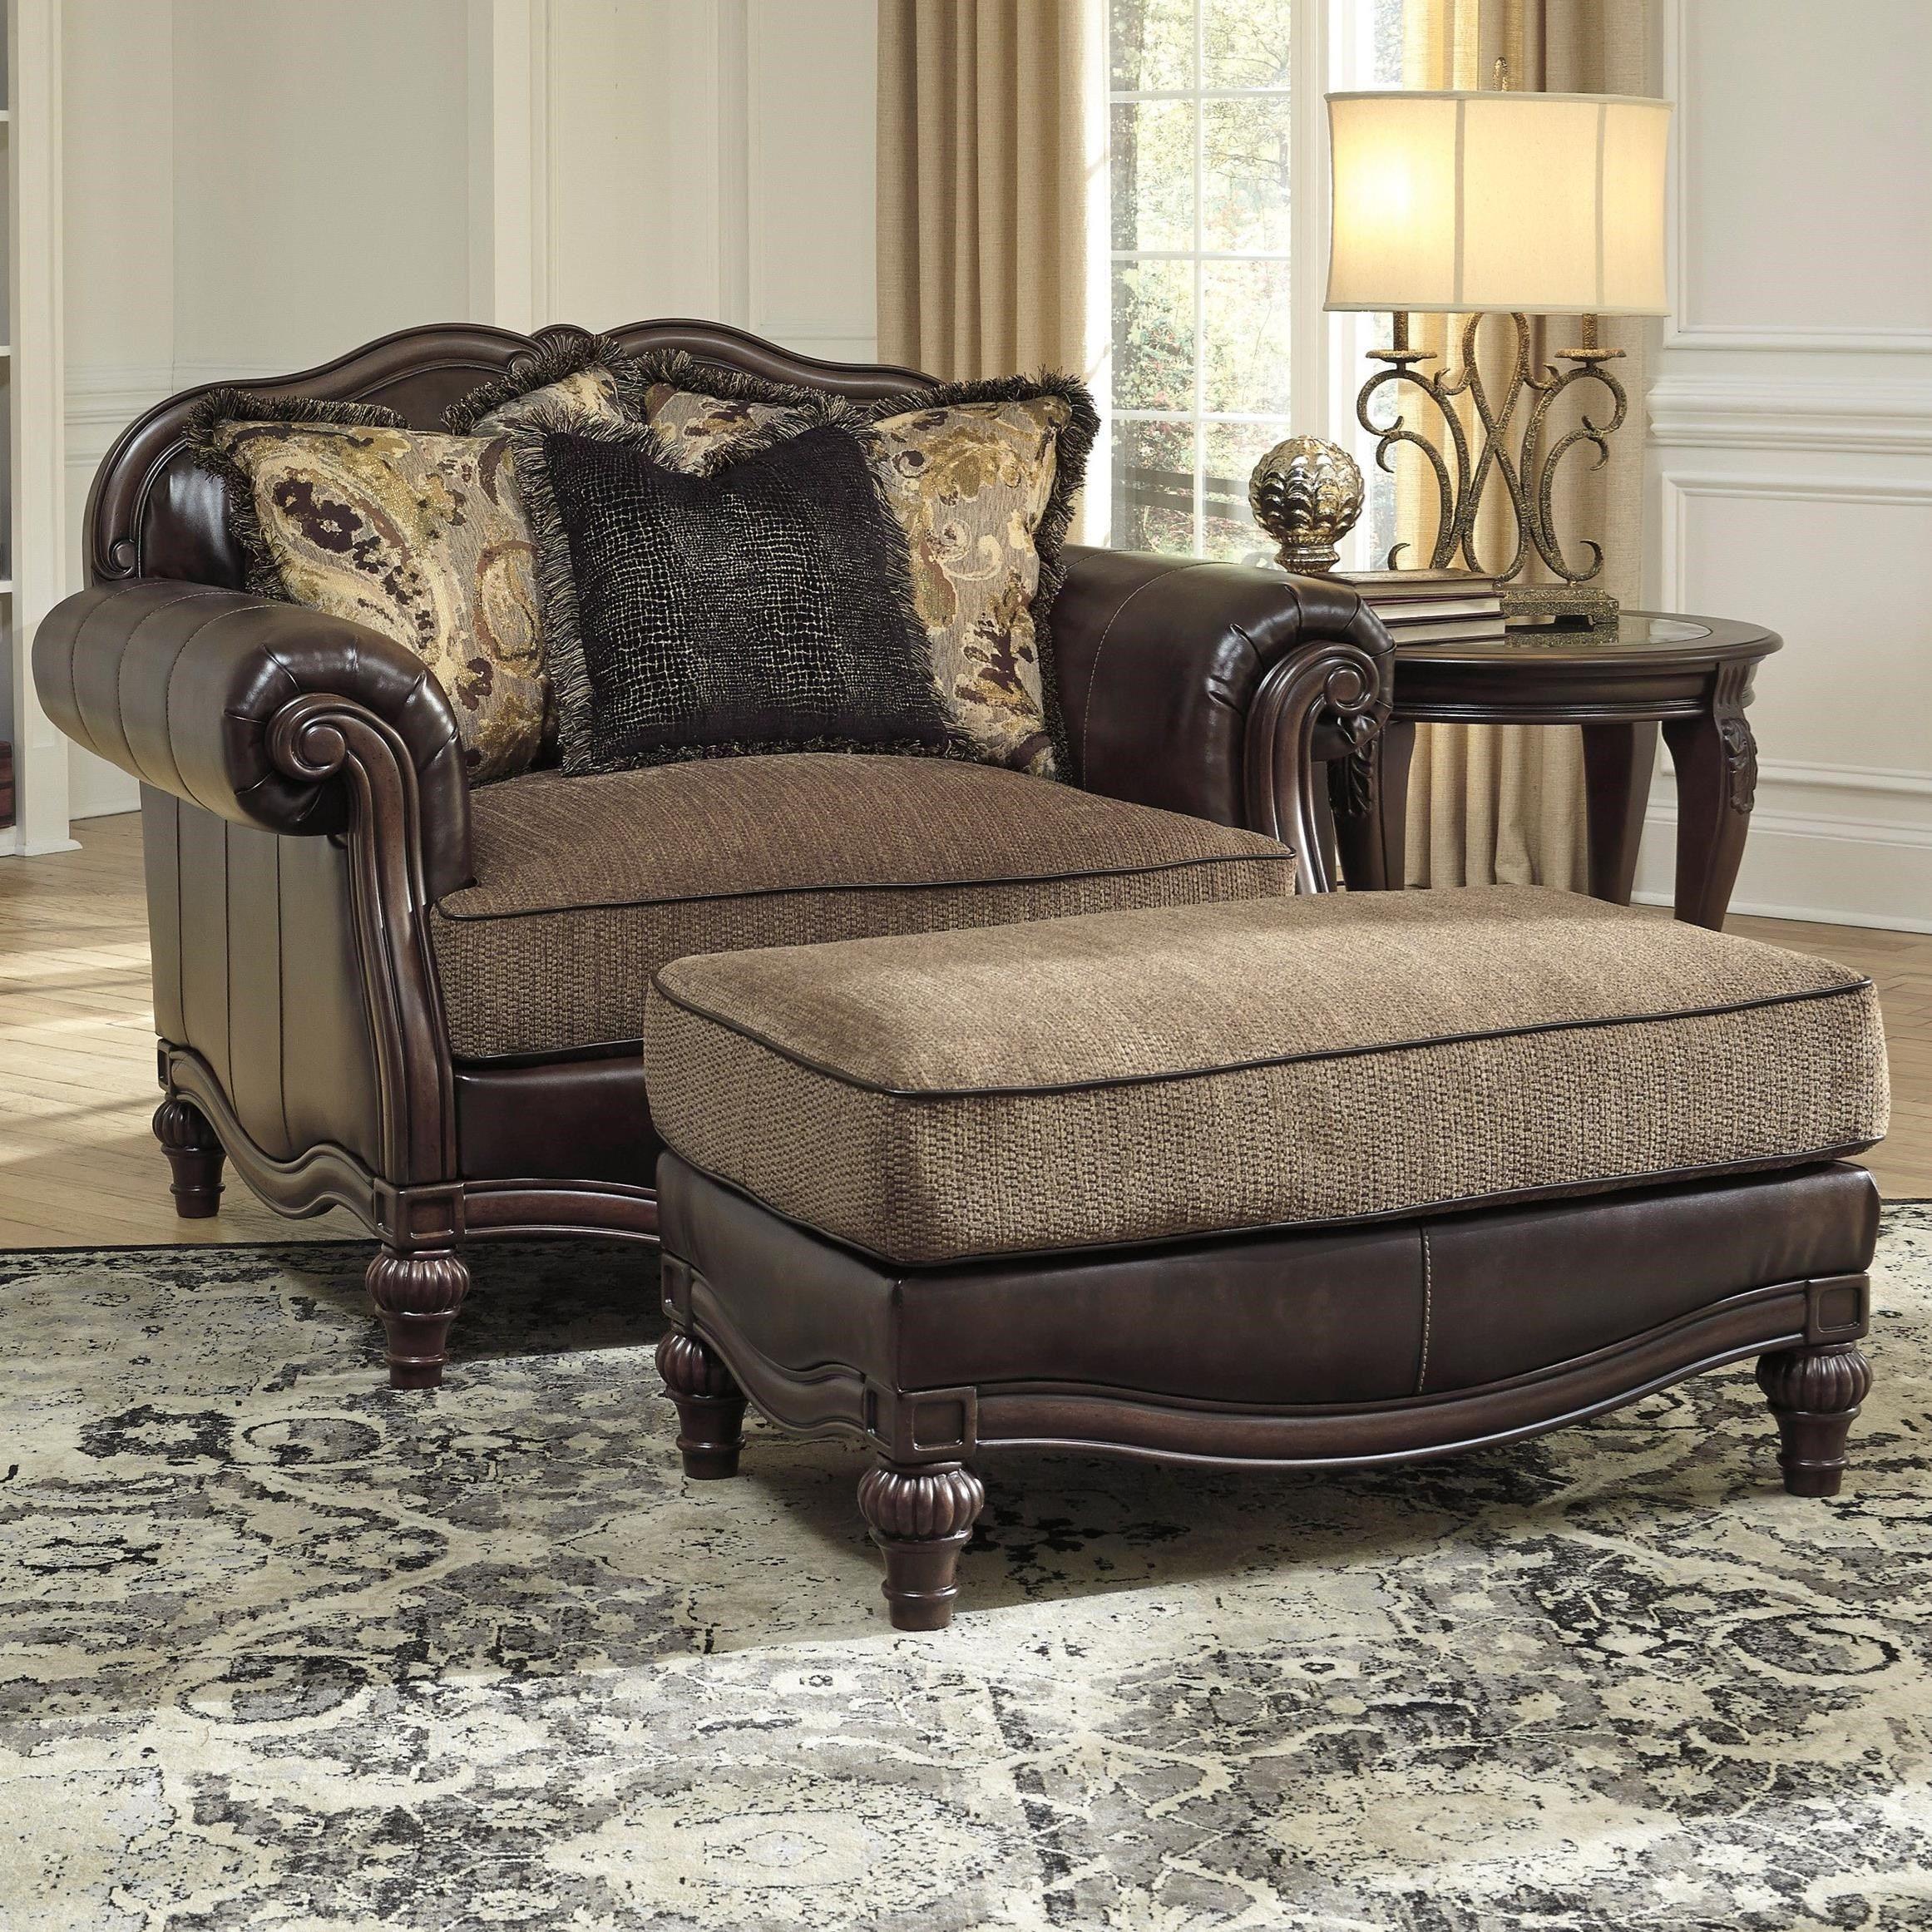 Winnsboro DuraBlend Chair and a Half Couch Pinterest